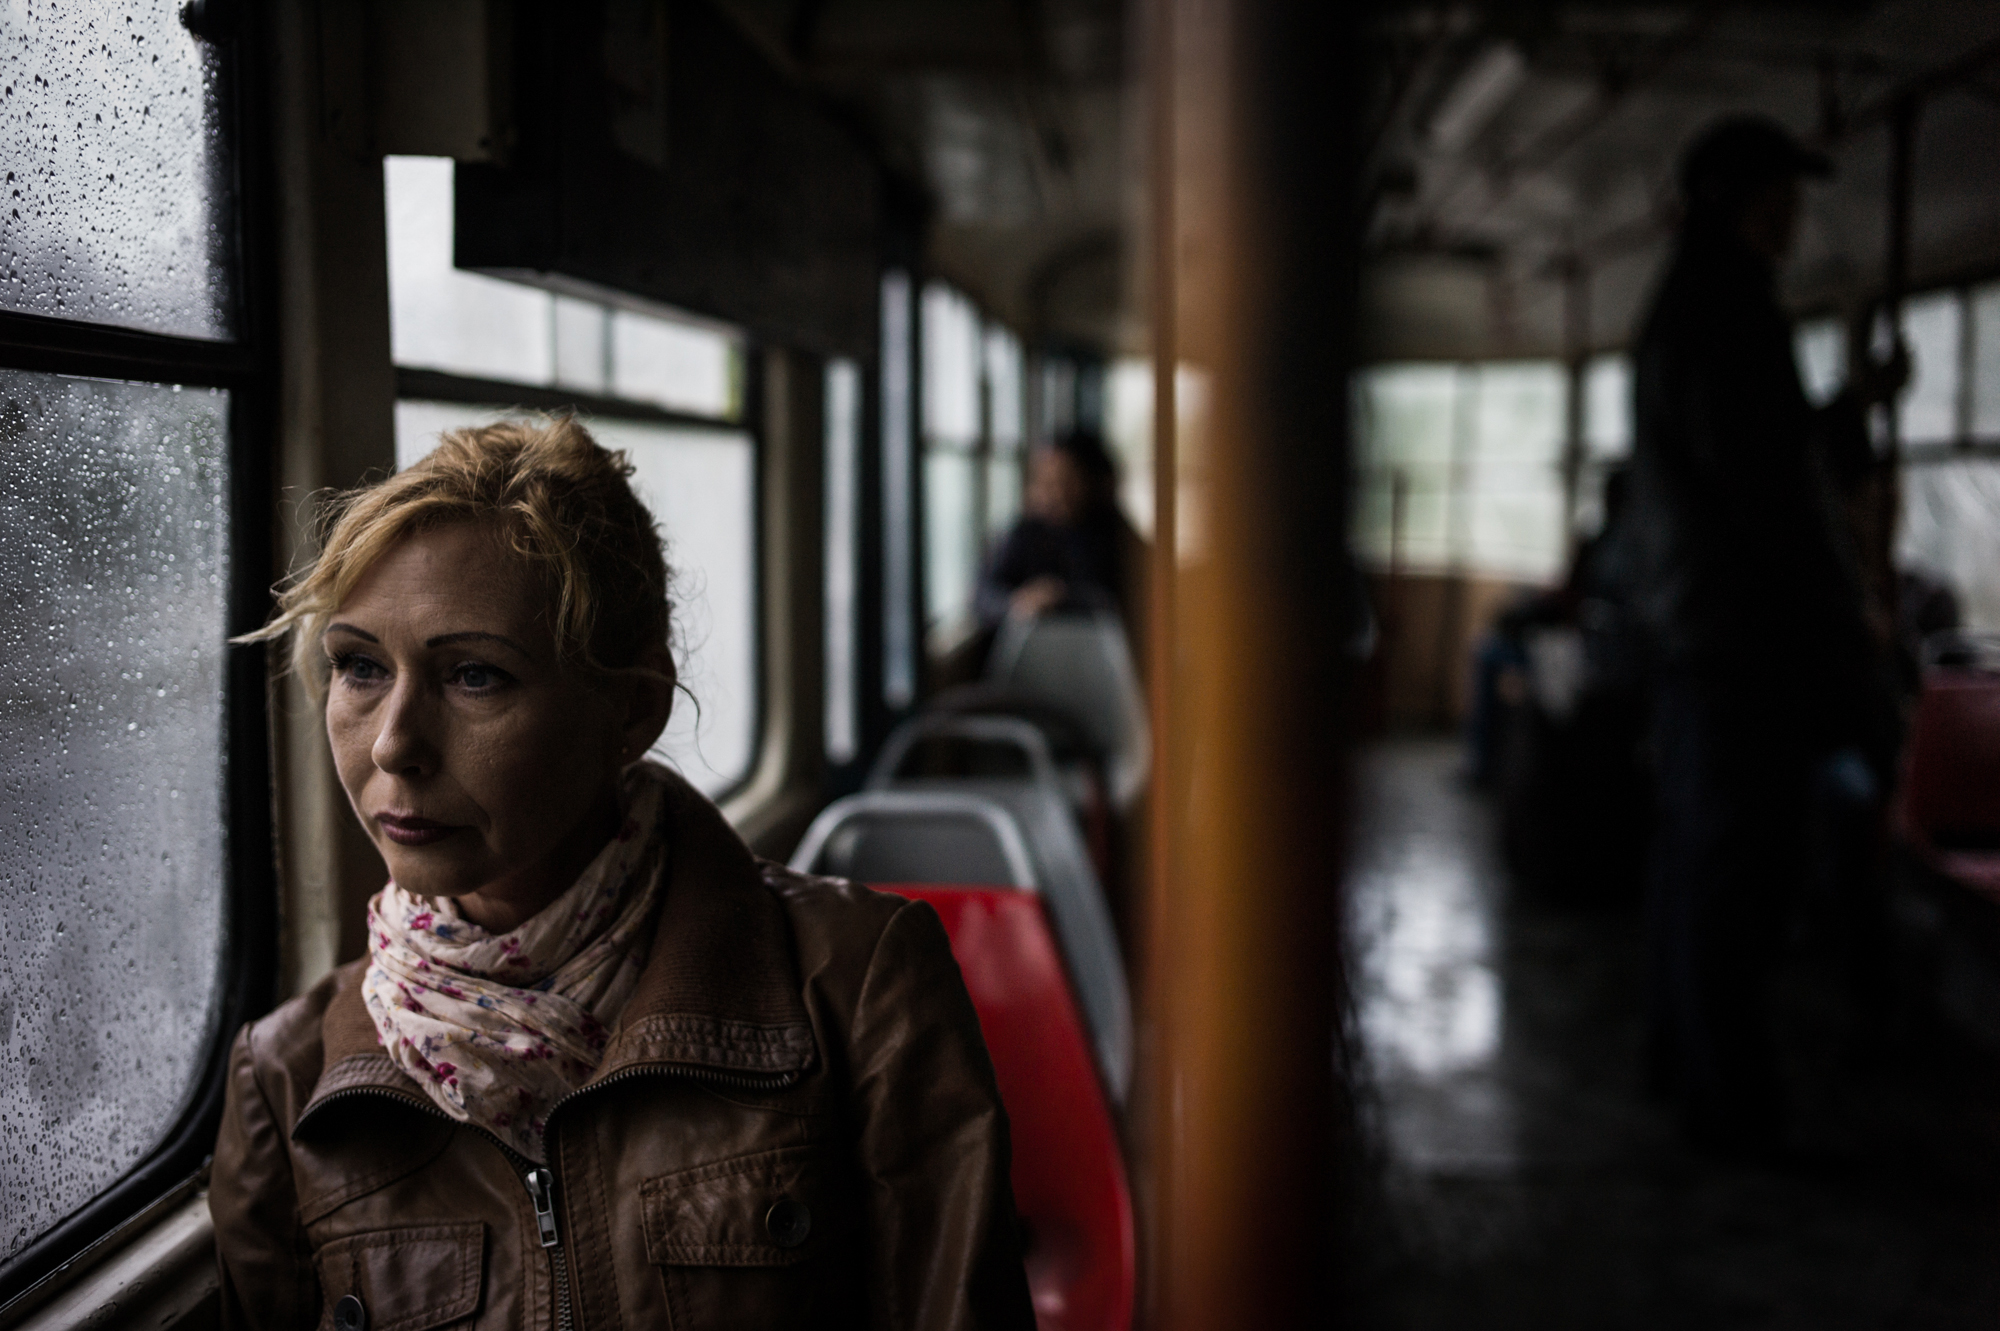 Ukraine has opened another window of life